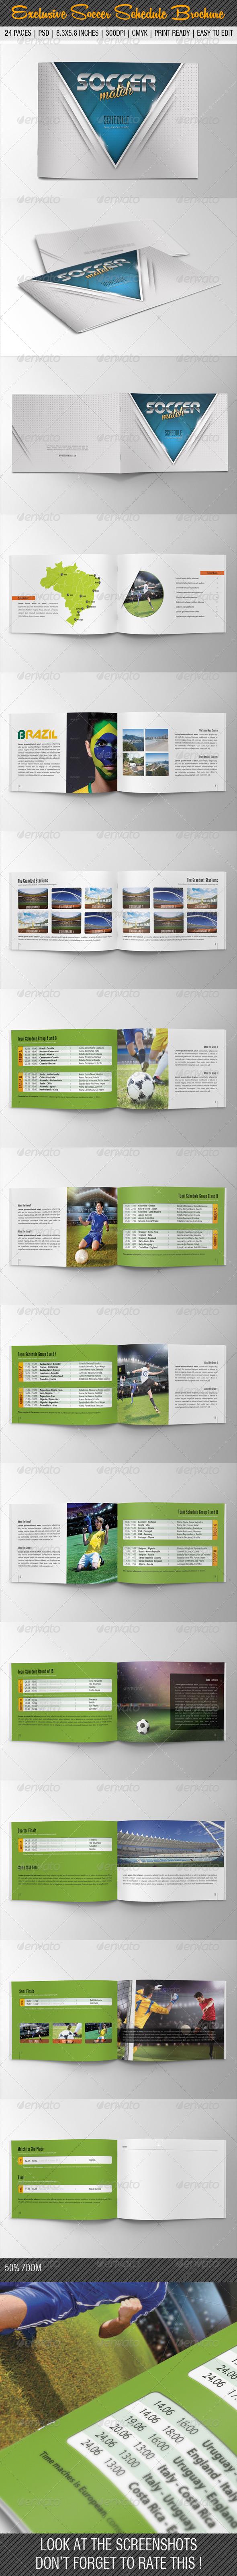 Exclusive Soccer Match Schedule 2014 Brochure